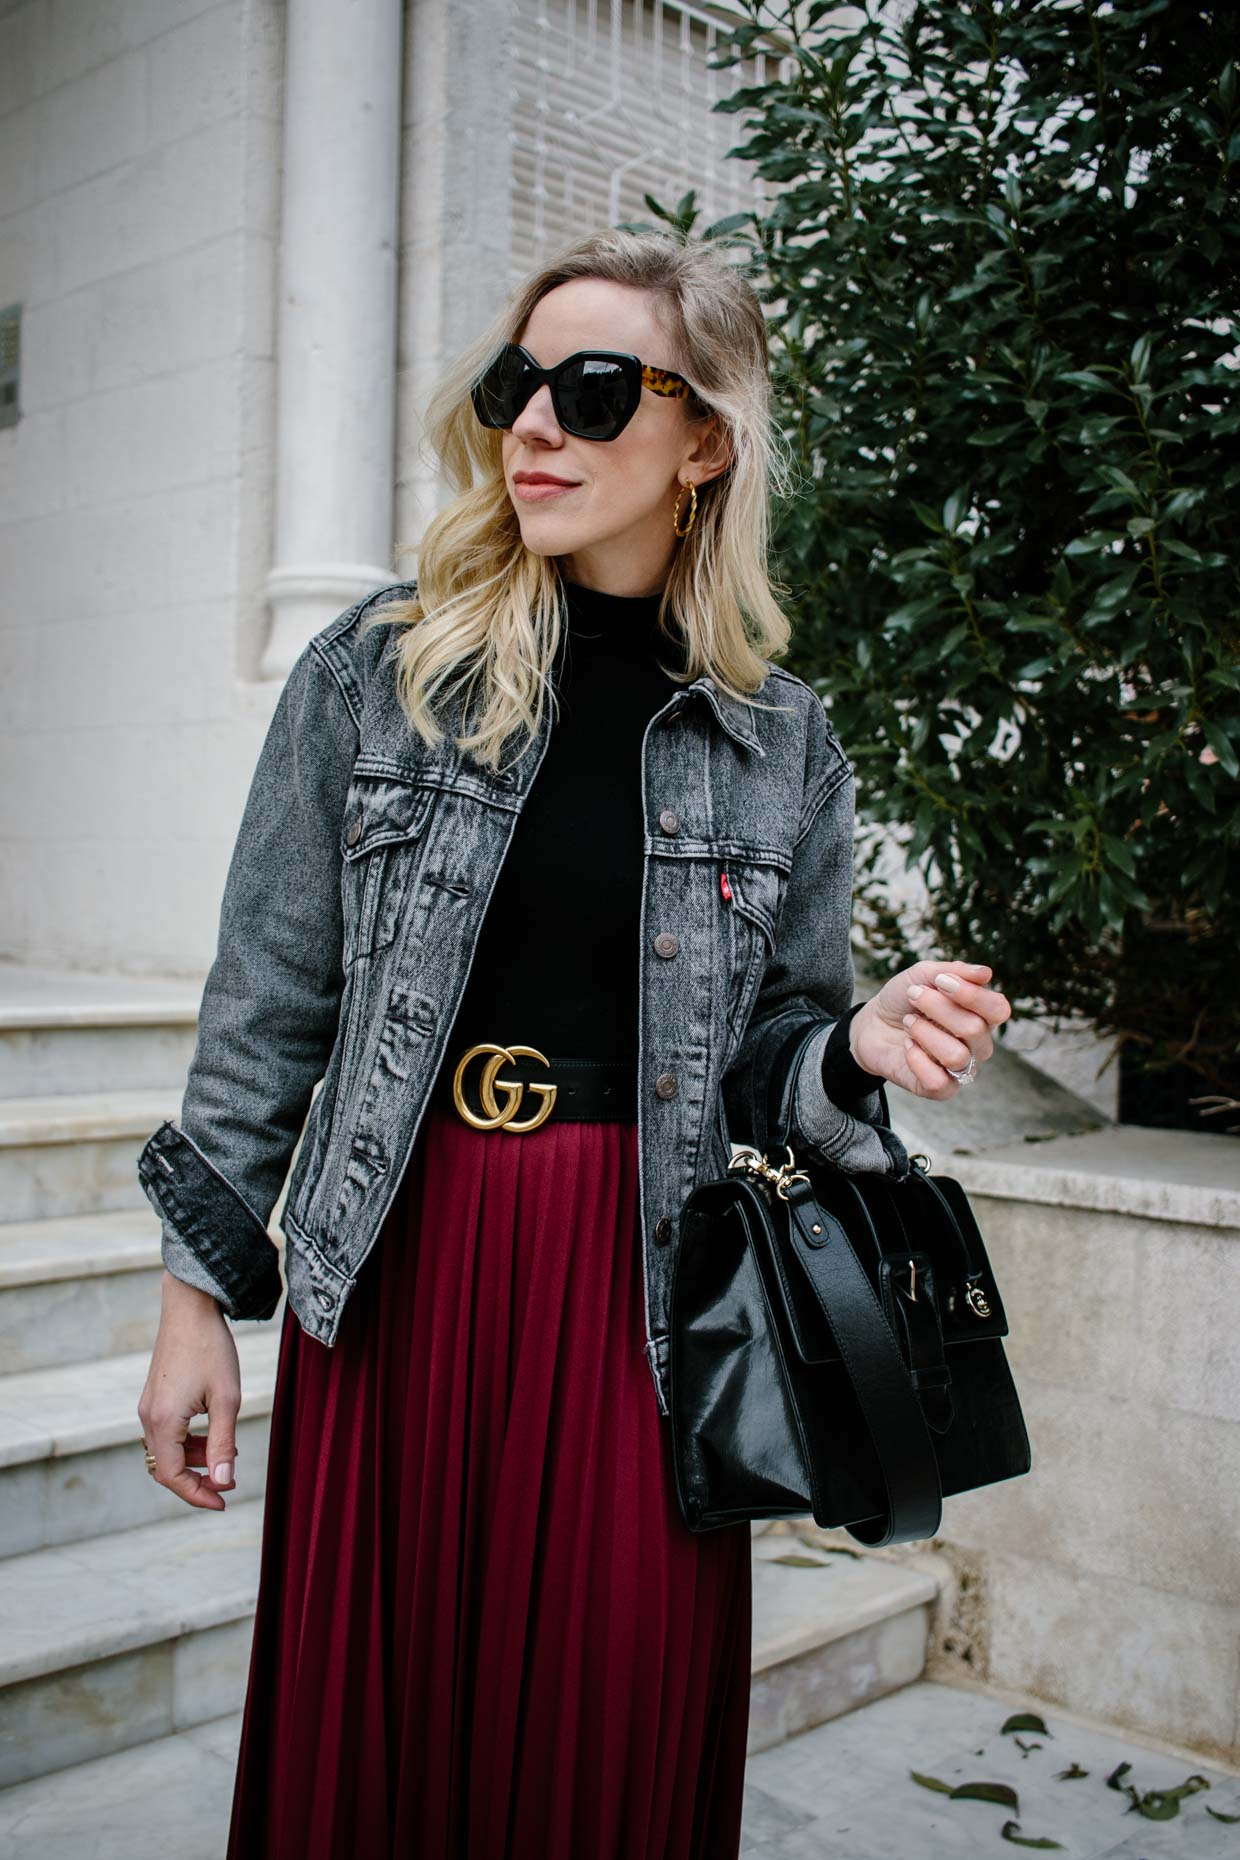 Meagan Brandon fashion blogger of Meagan's Moda styles Levi's black denim trucker jacket with Gucci belt, burgundy pleated skirt and black bodysuit